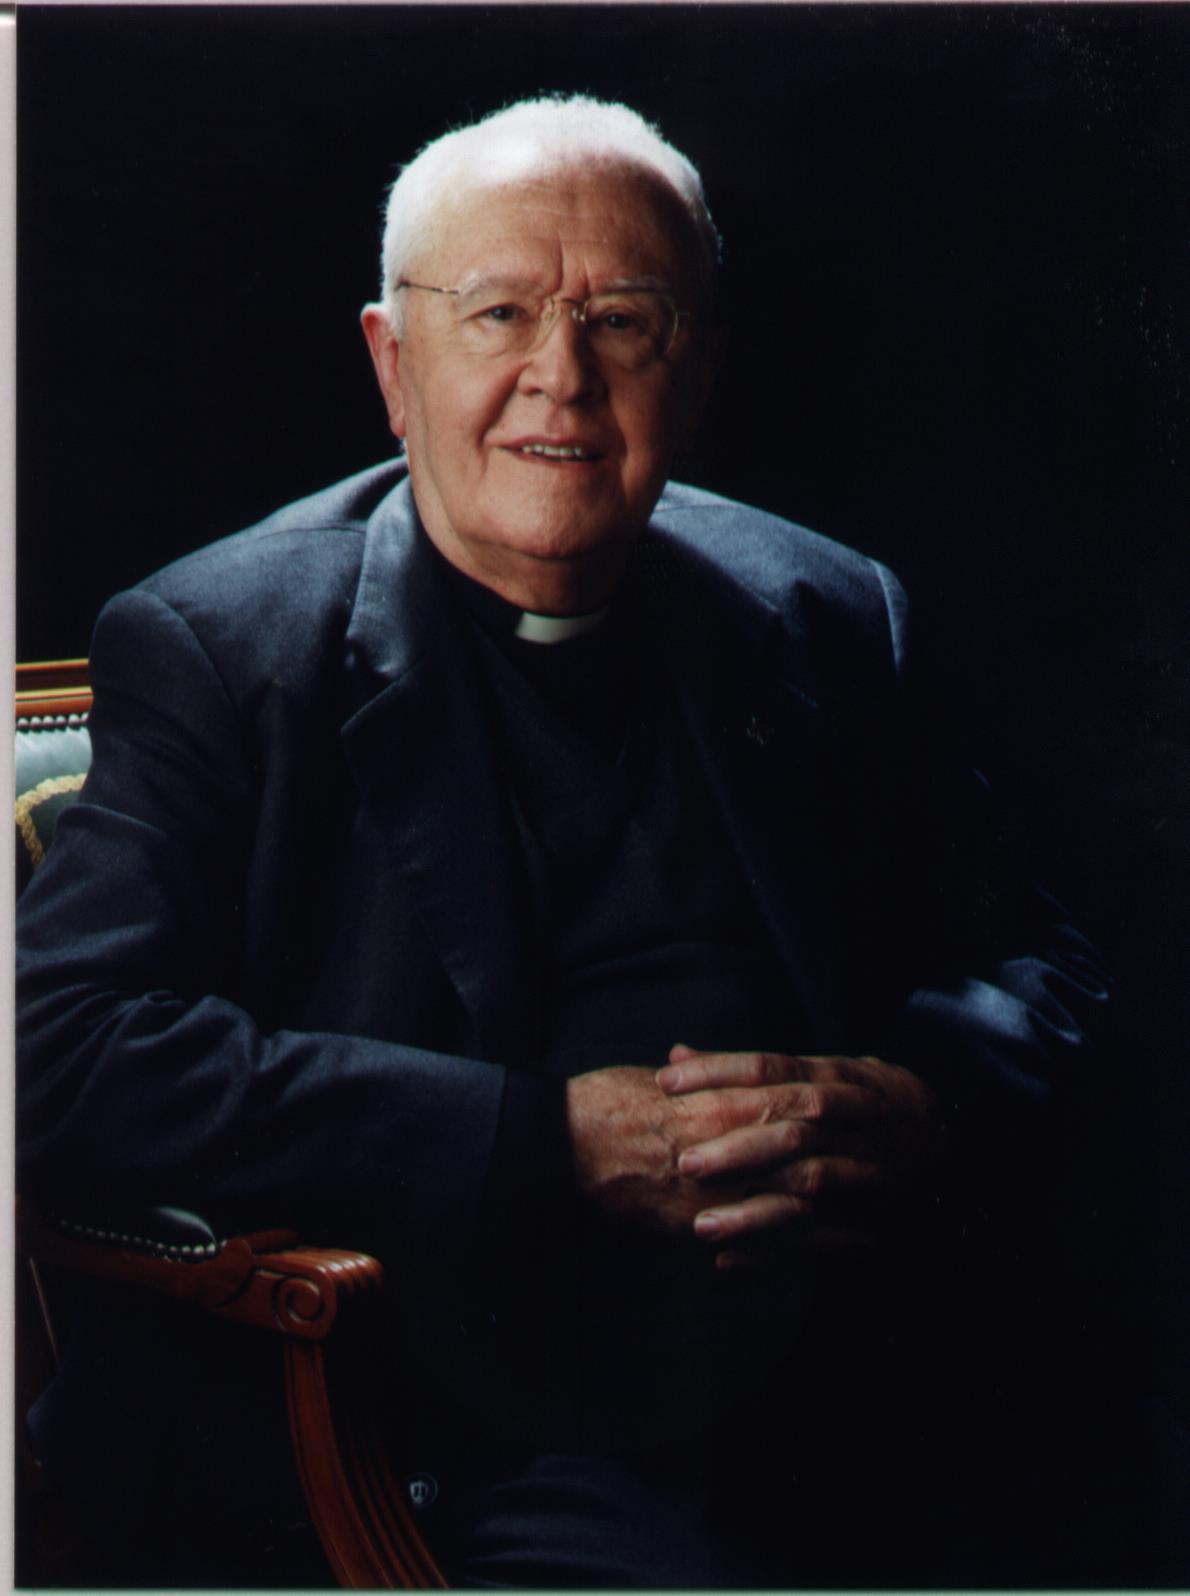 Sr. Àngel Fàbrega